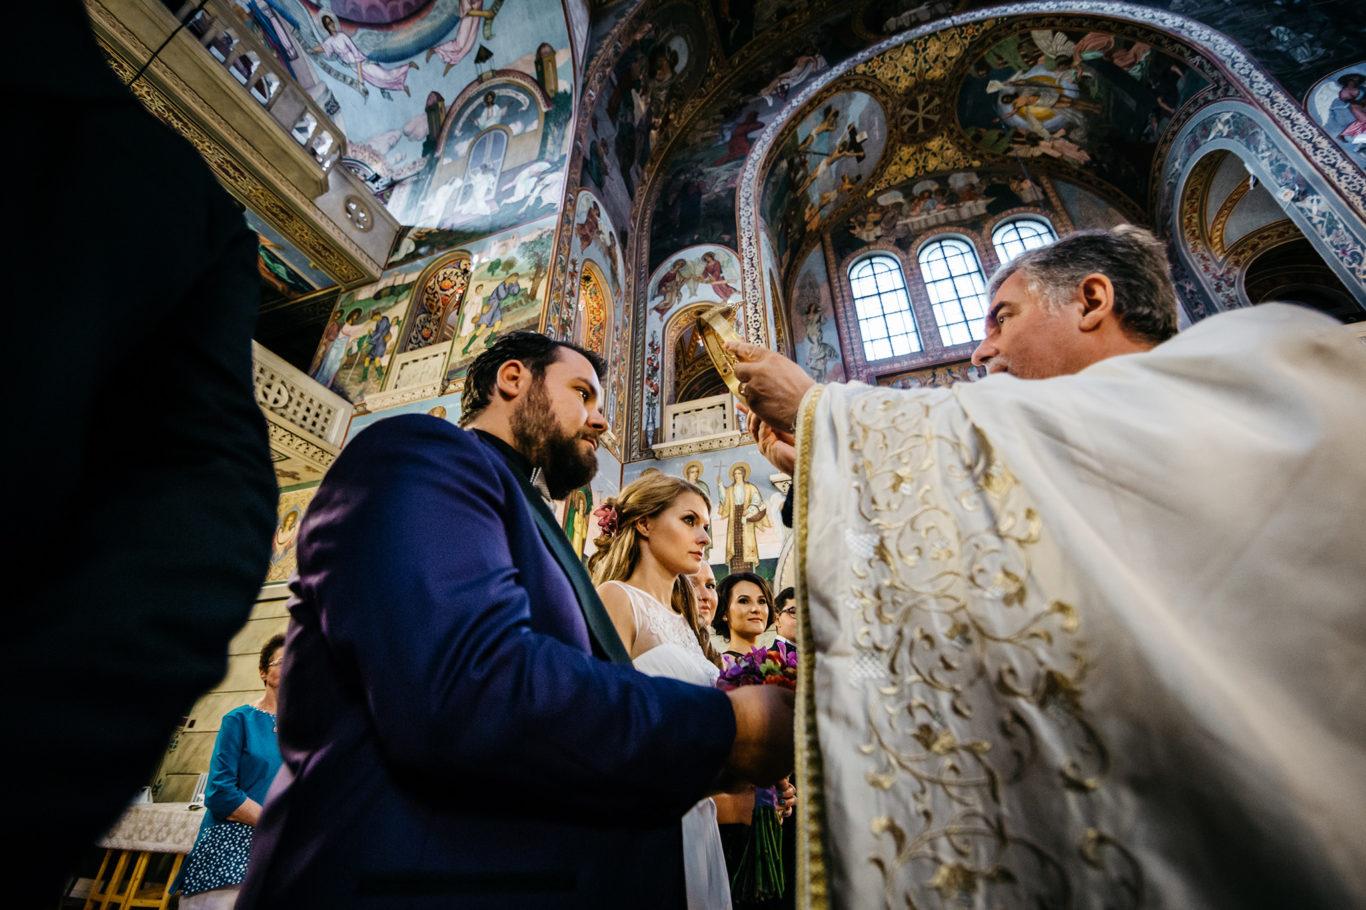 0368-fotografie-nunta-bucuresti-rodica-rares-fotograf-ciprian-dumitrescu-dc1_0312